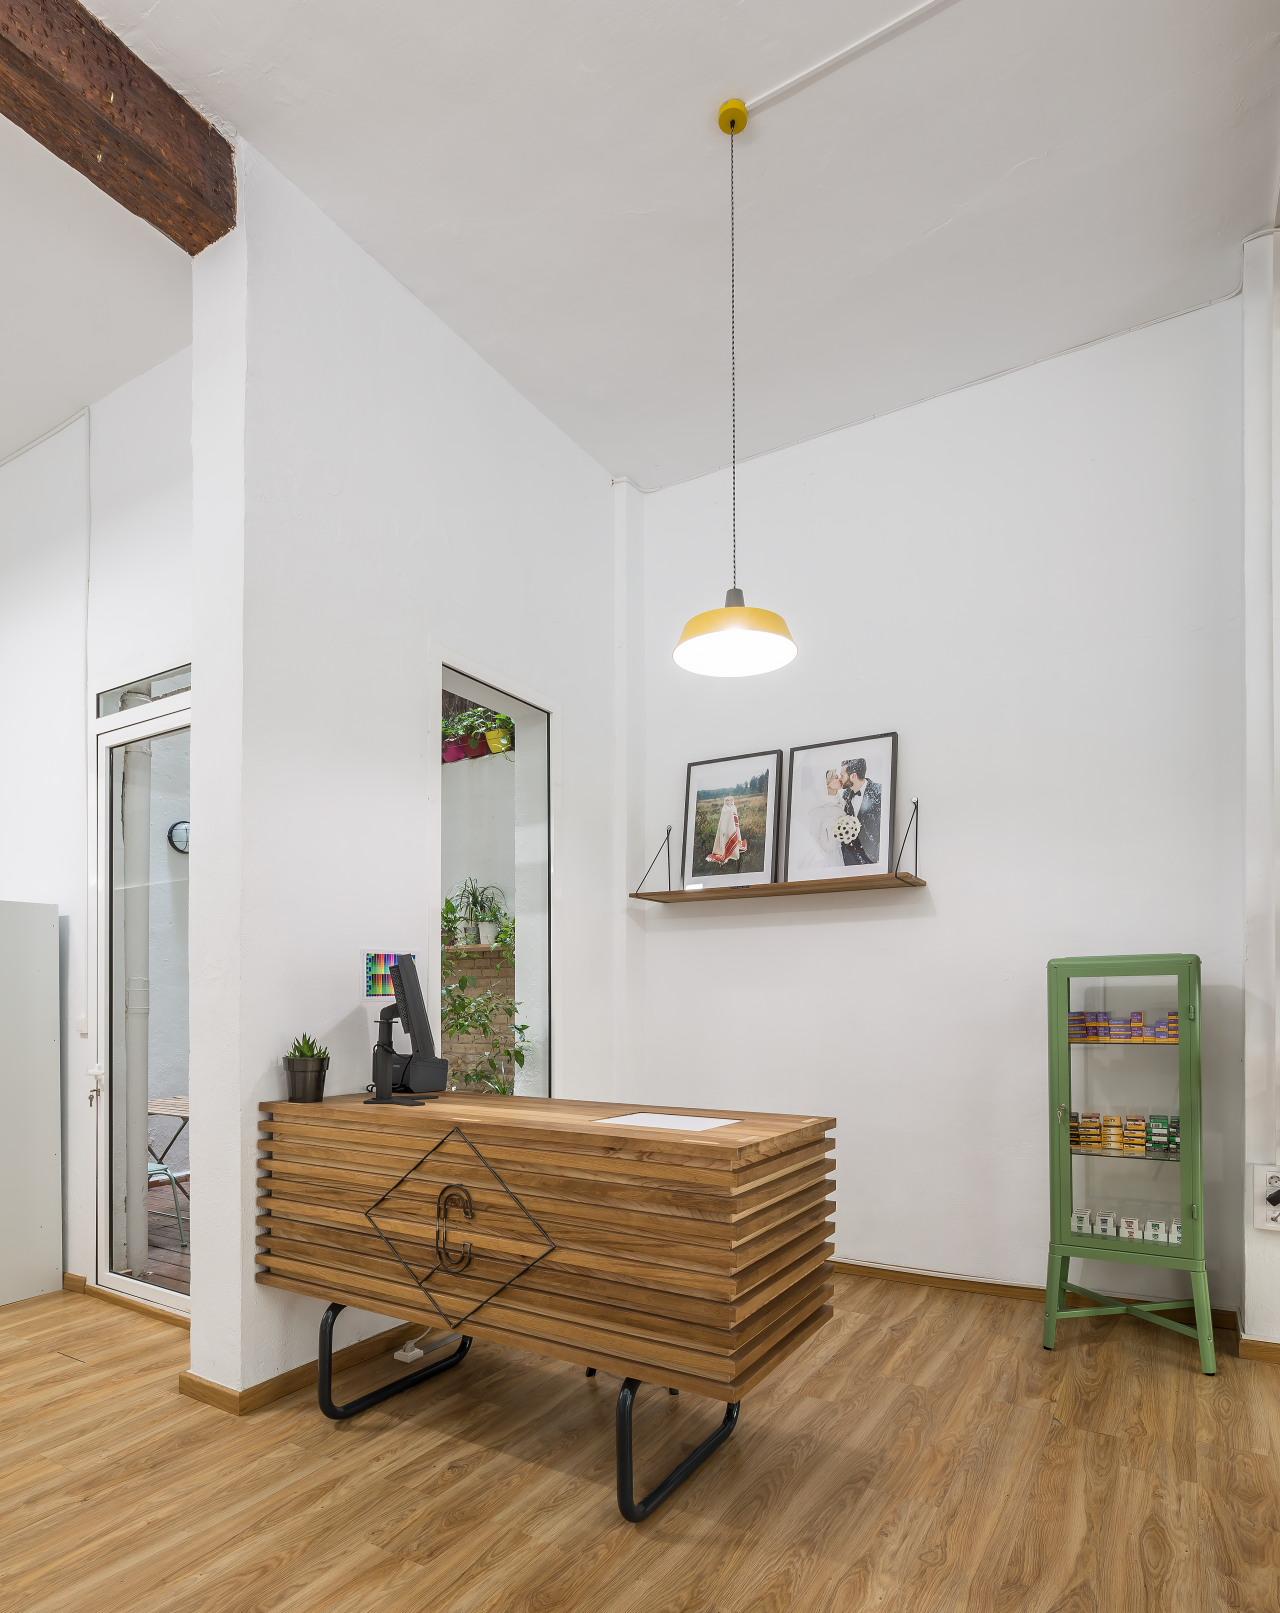 fotografia-arquitectura-interiorismo-valencia-german-cabo-boubau-carmencita-carmencitafilmlab (11)